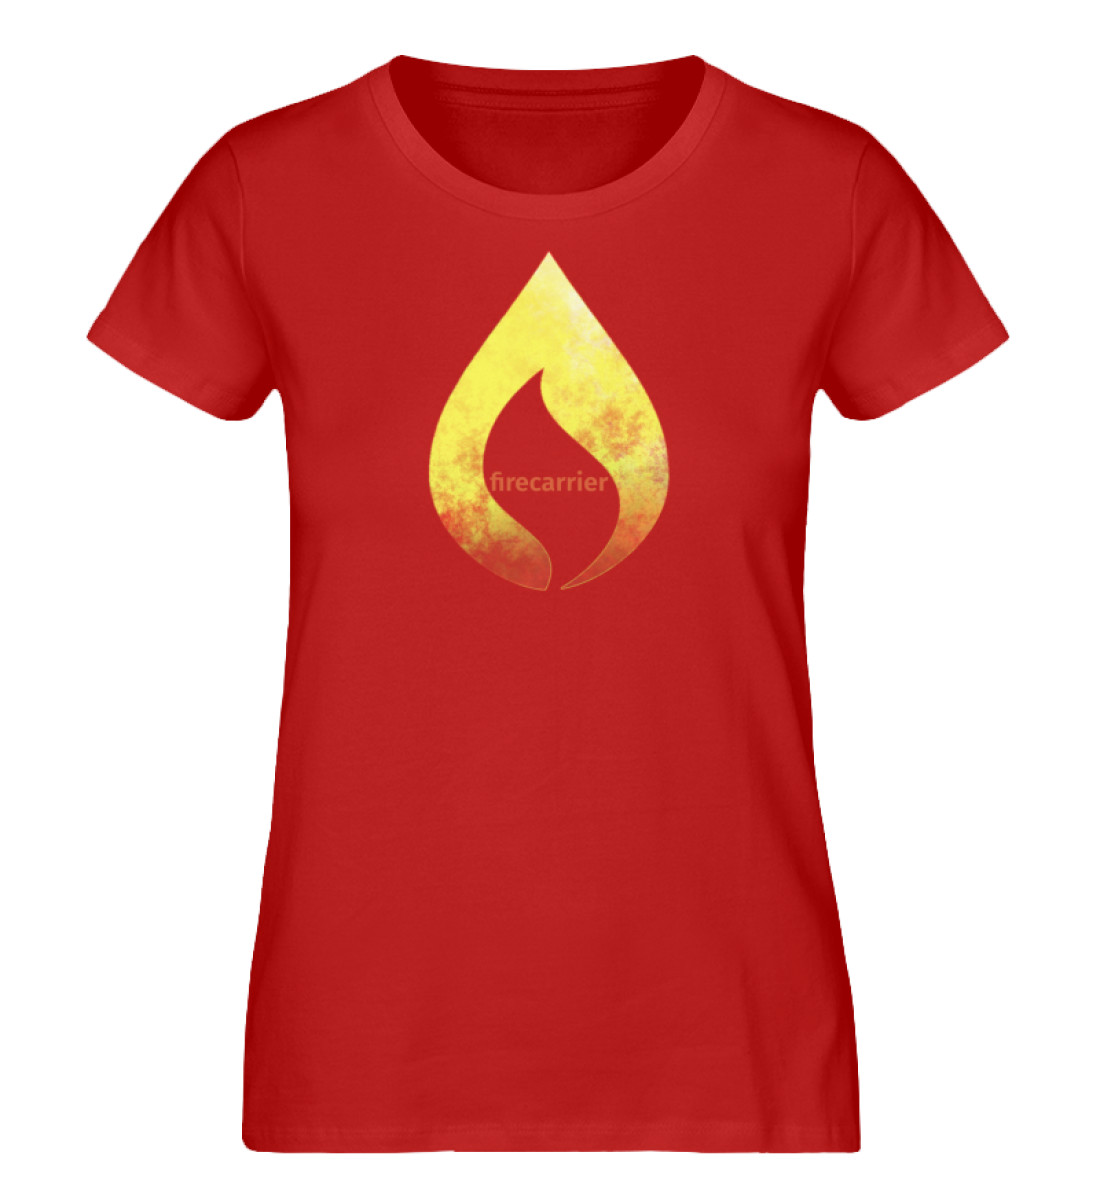 hot fire - Damen Premium Organic Shirt-4